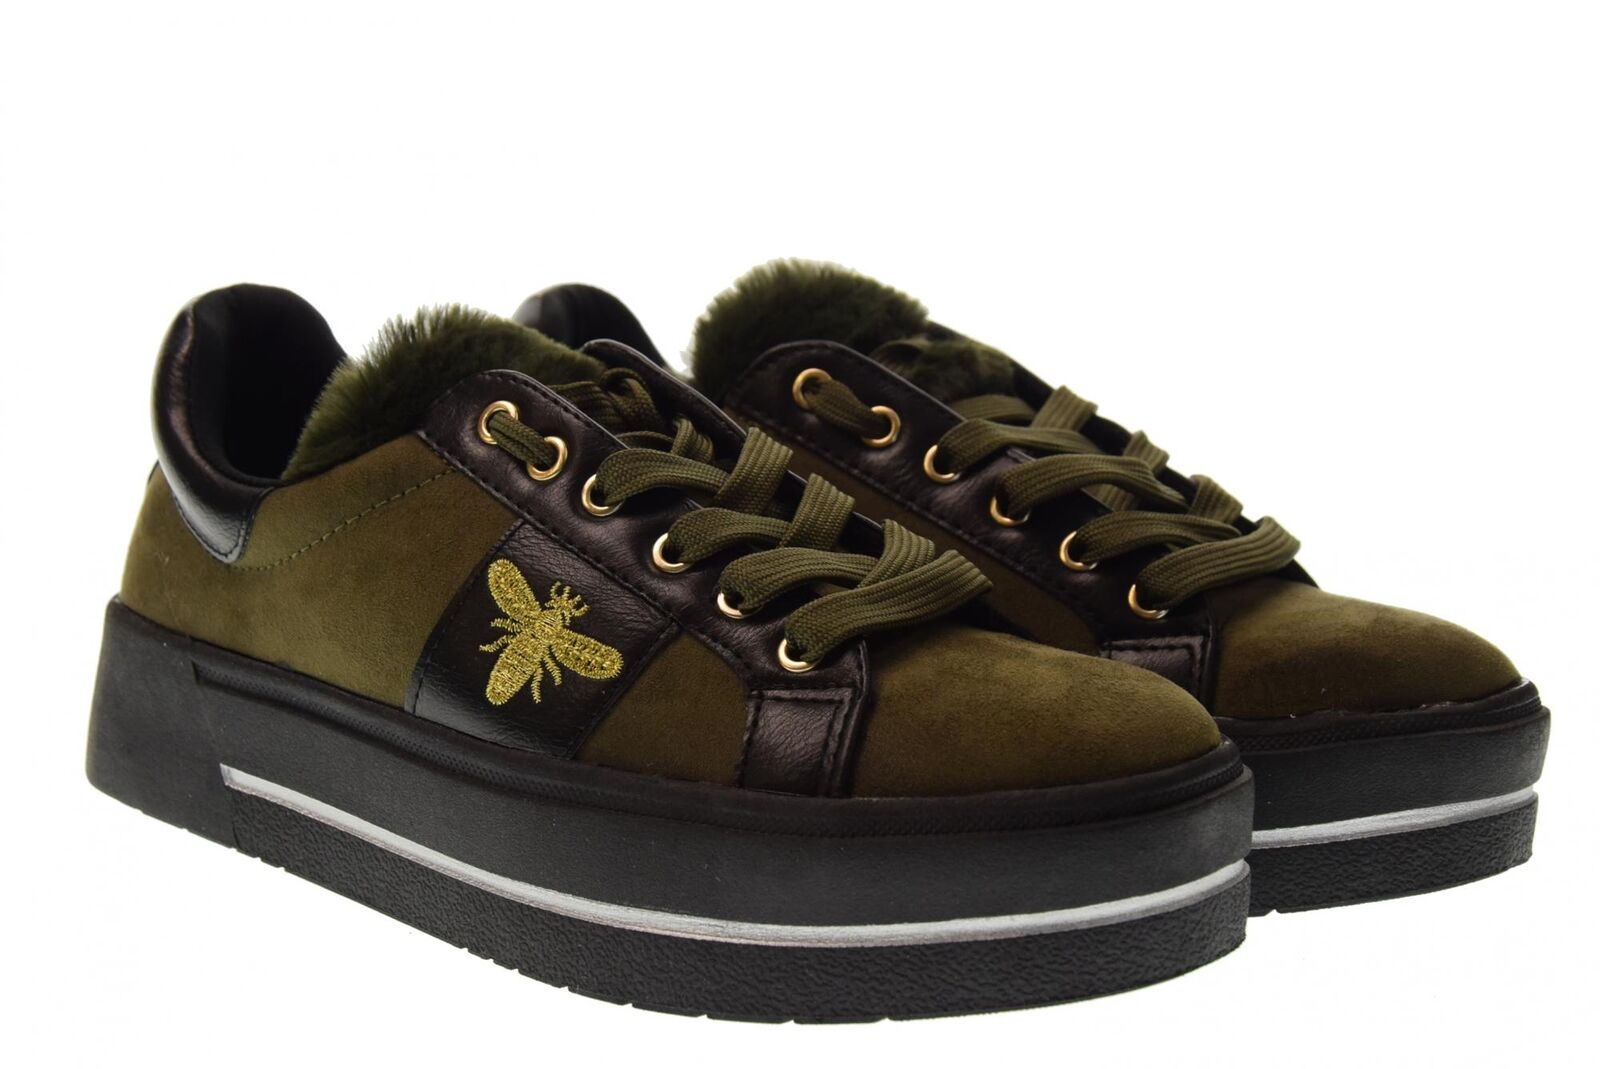 B3d shoes A18u shoes woman low platform sneakers 41577 khaki